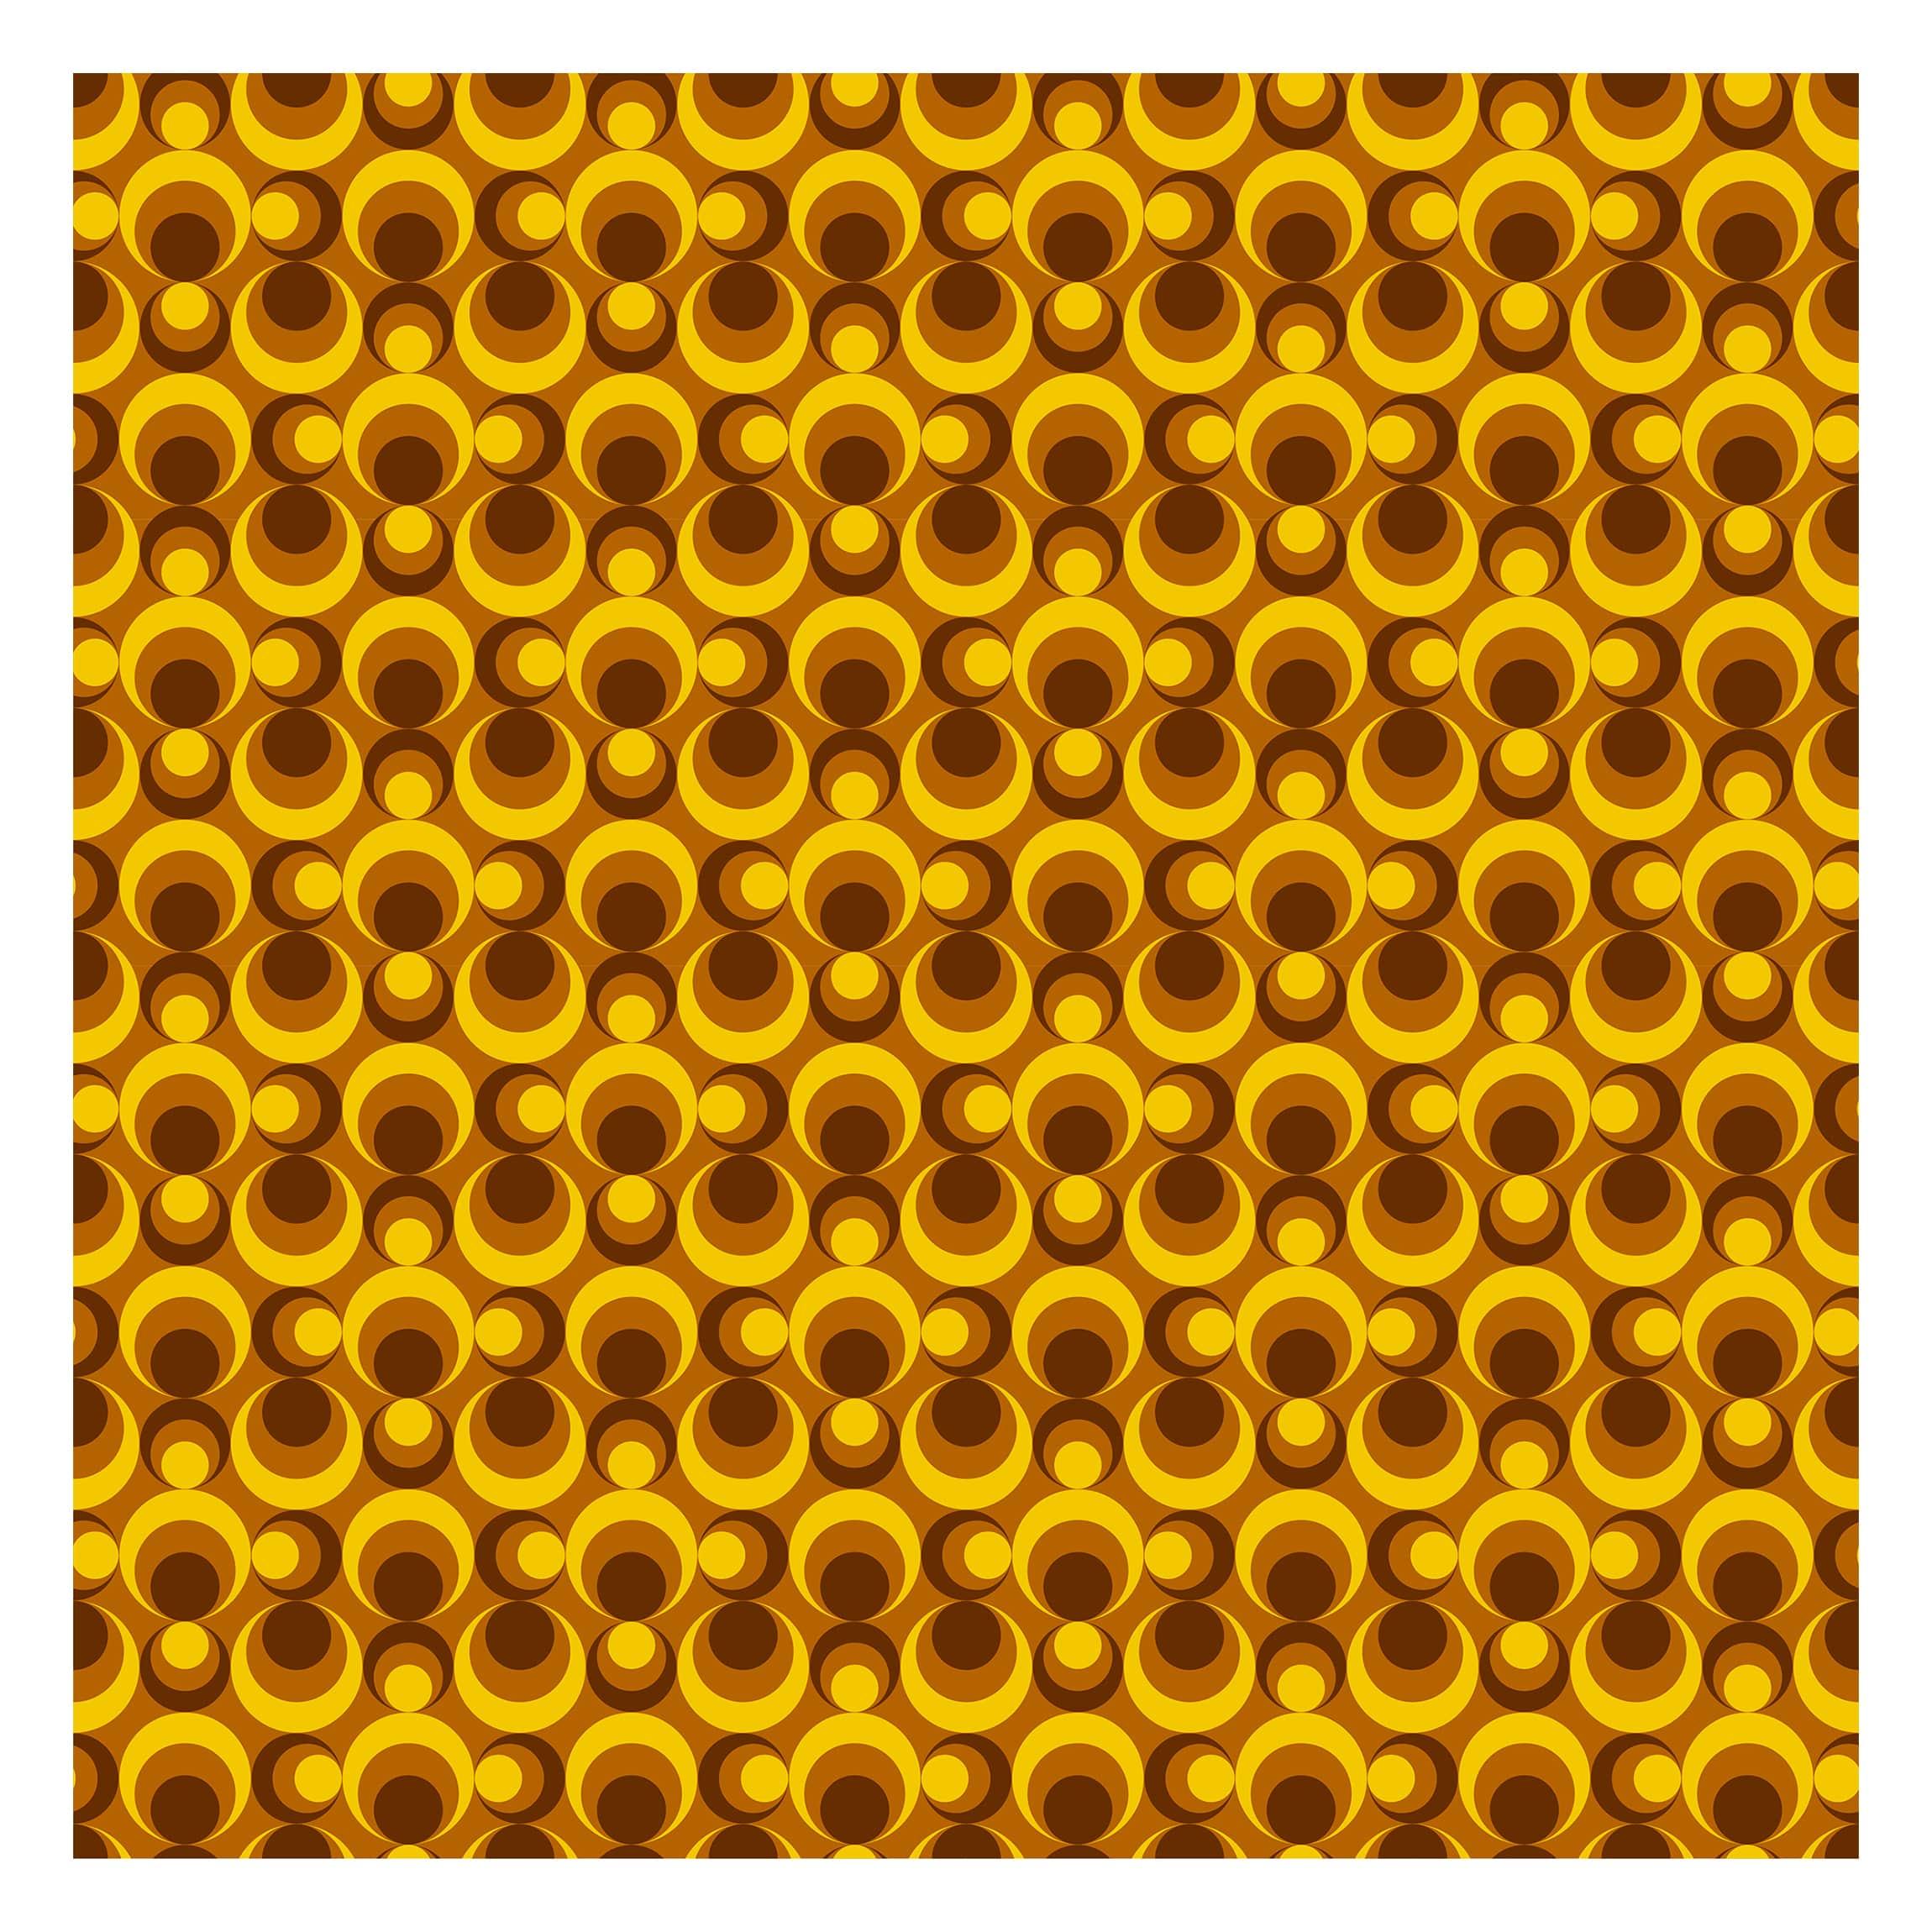 Tapete selbstklebend - 70er Jahre Tapete Kreisdesign - Fototapete Quadrat